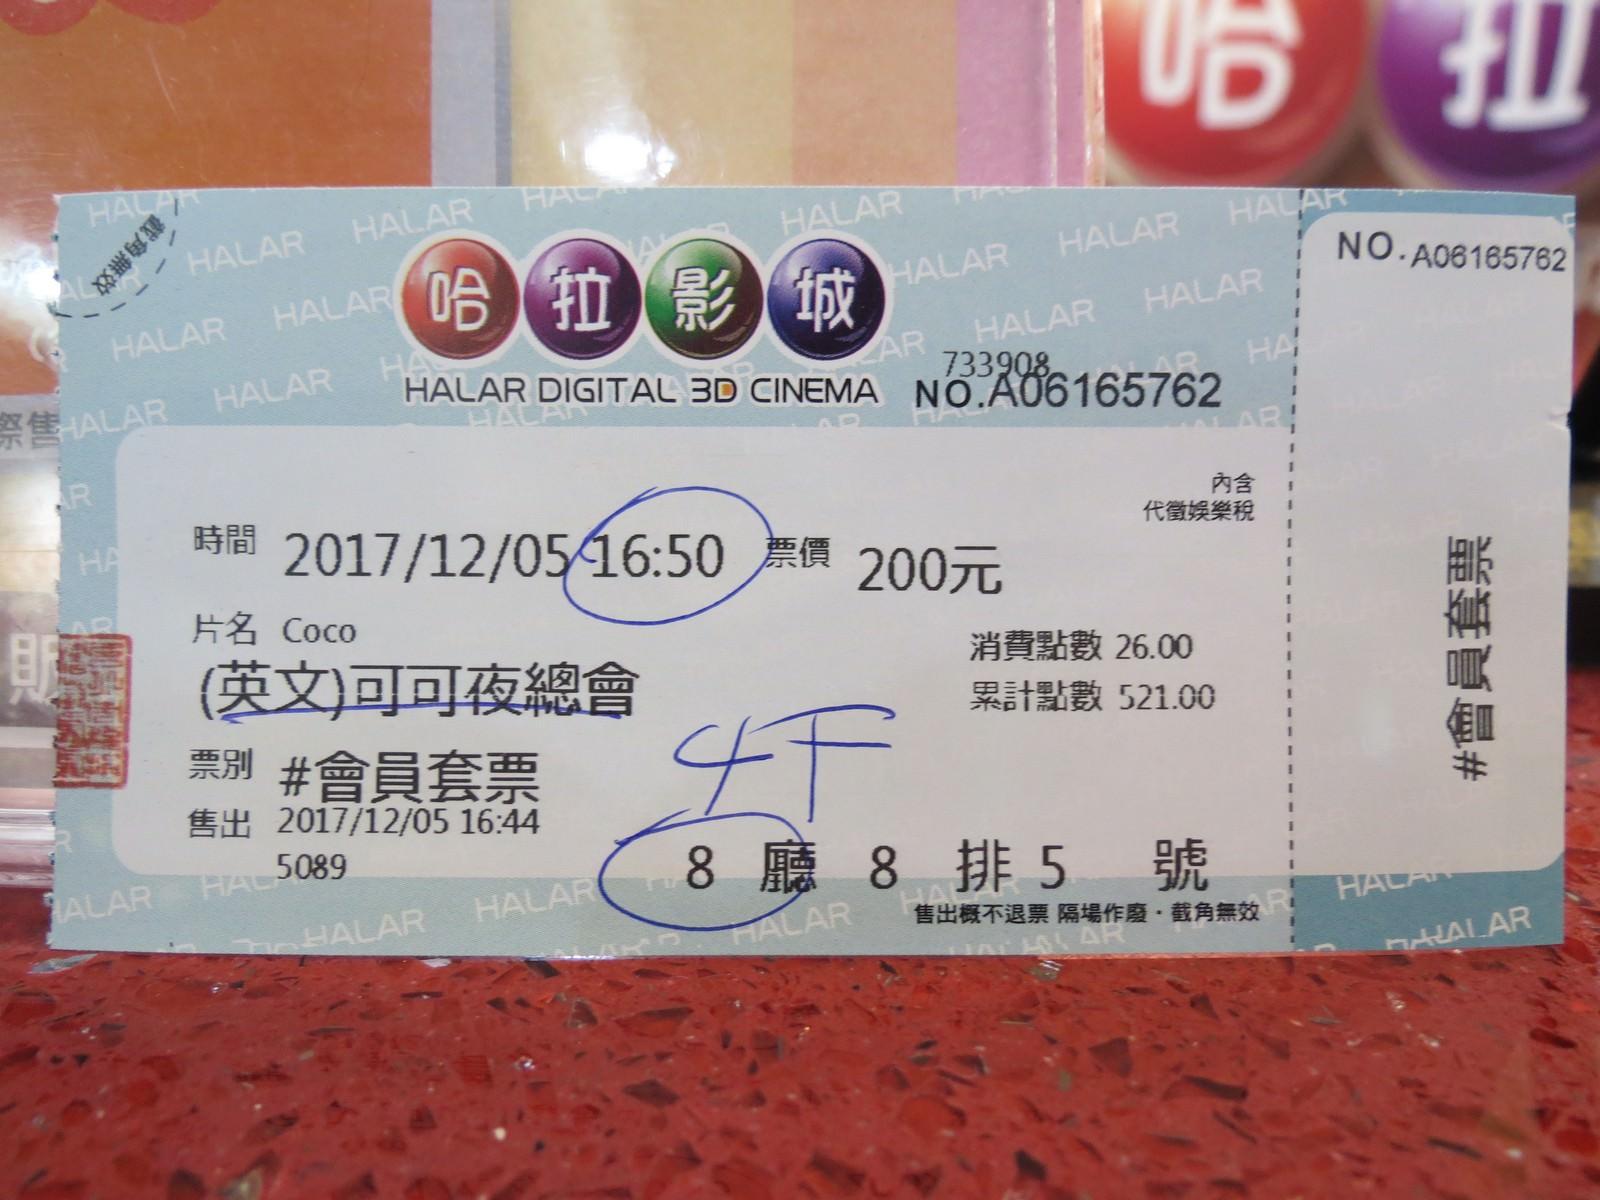 Movie, Coco(美國, 2017年) / 可可夜總會(台灣) / 寻梦环游记(中國) / 玩轉極樂園(香港), 電影票